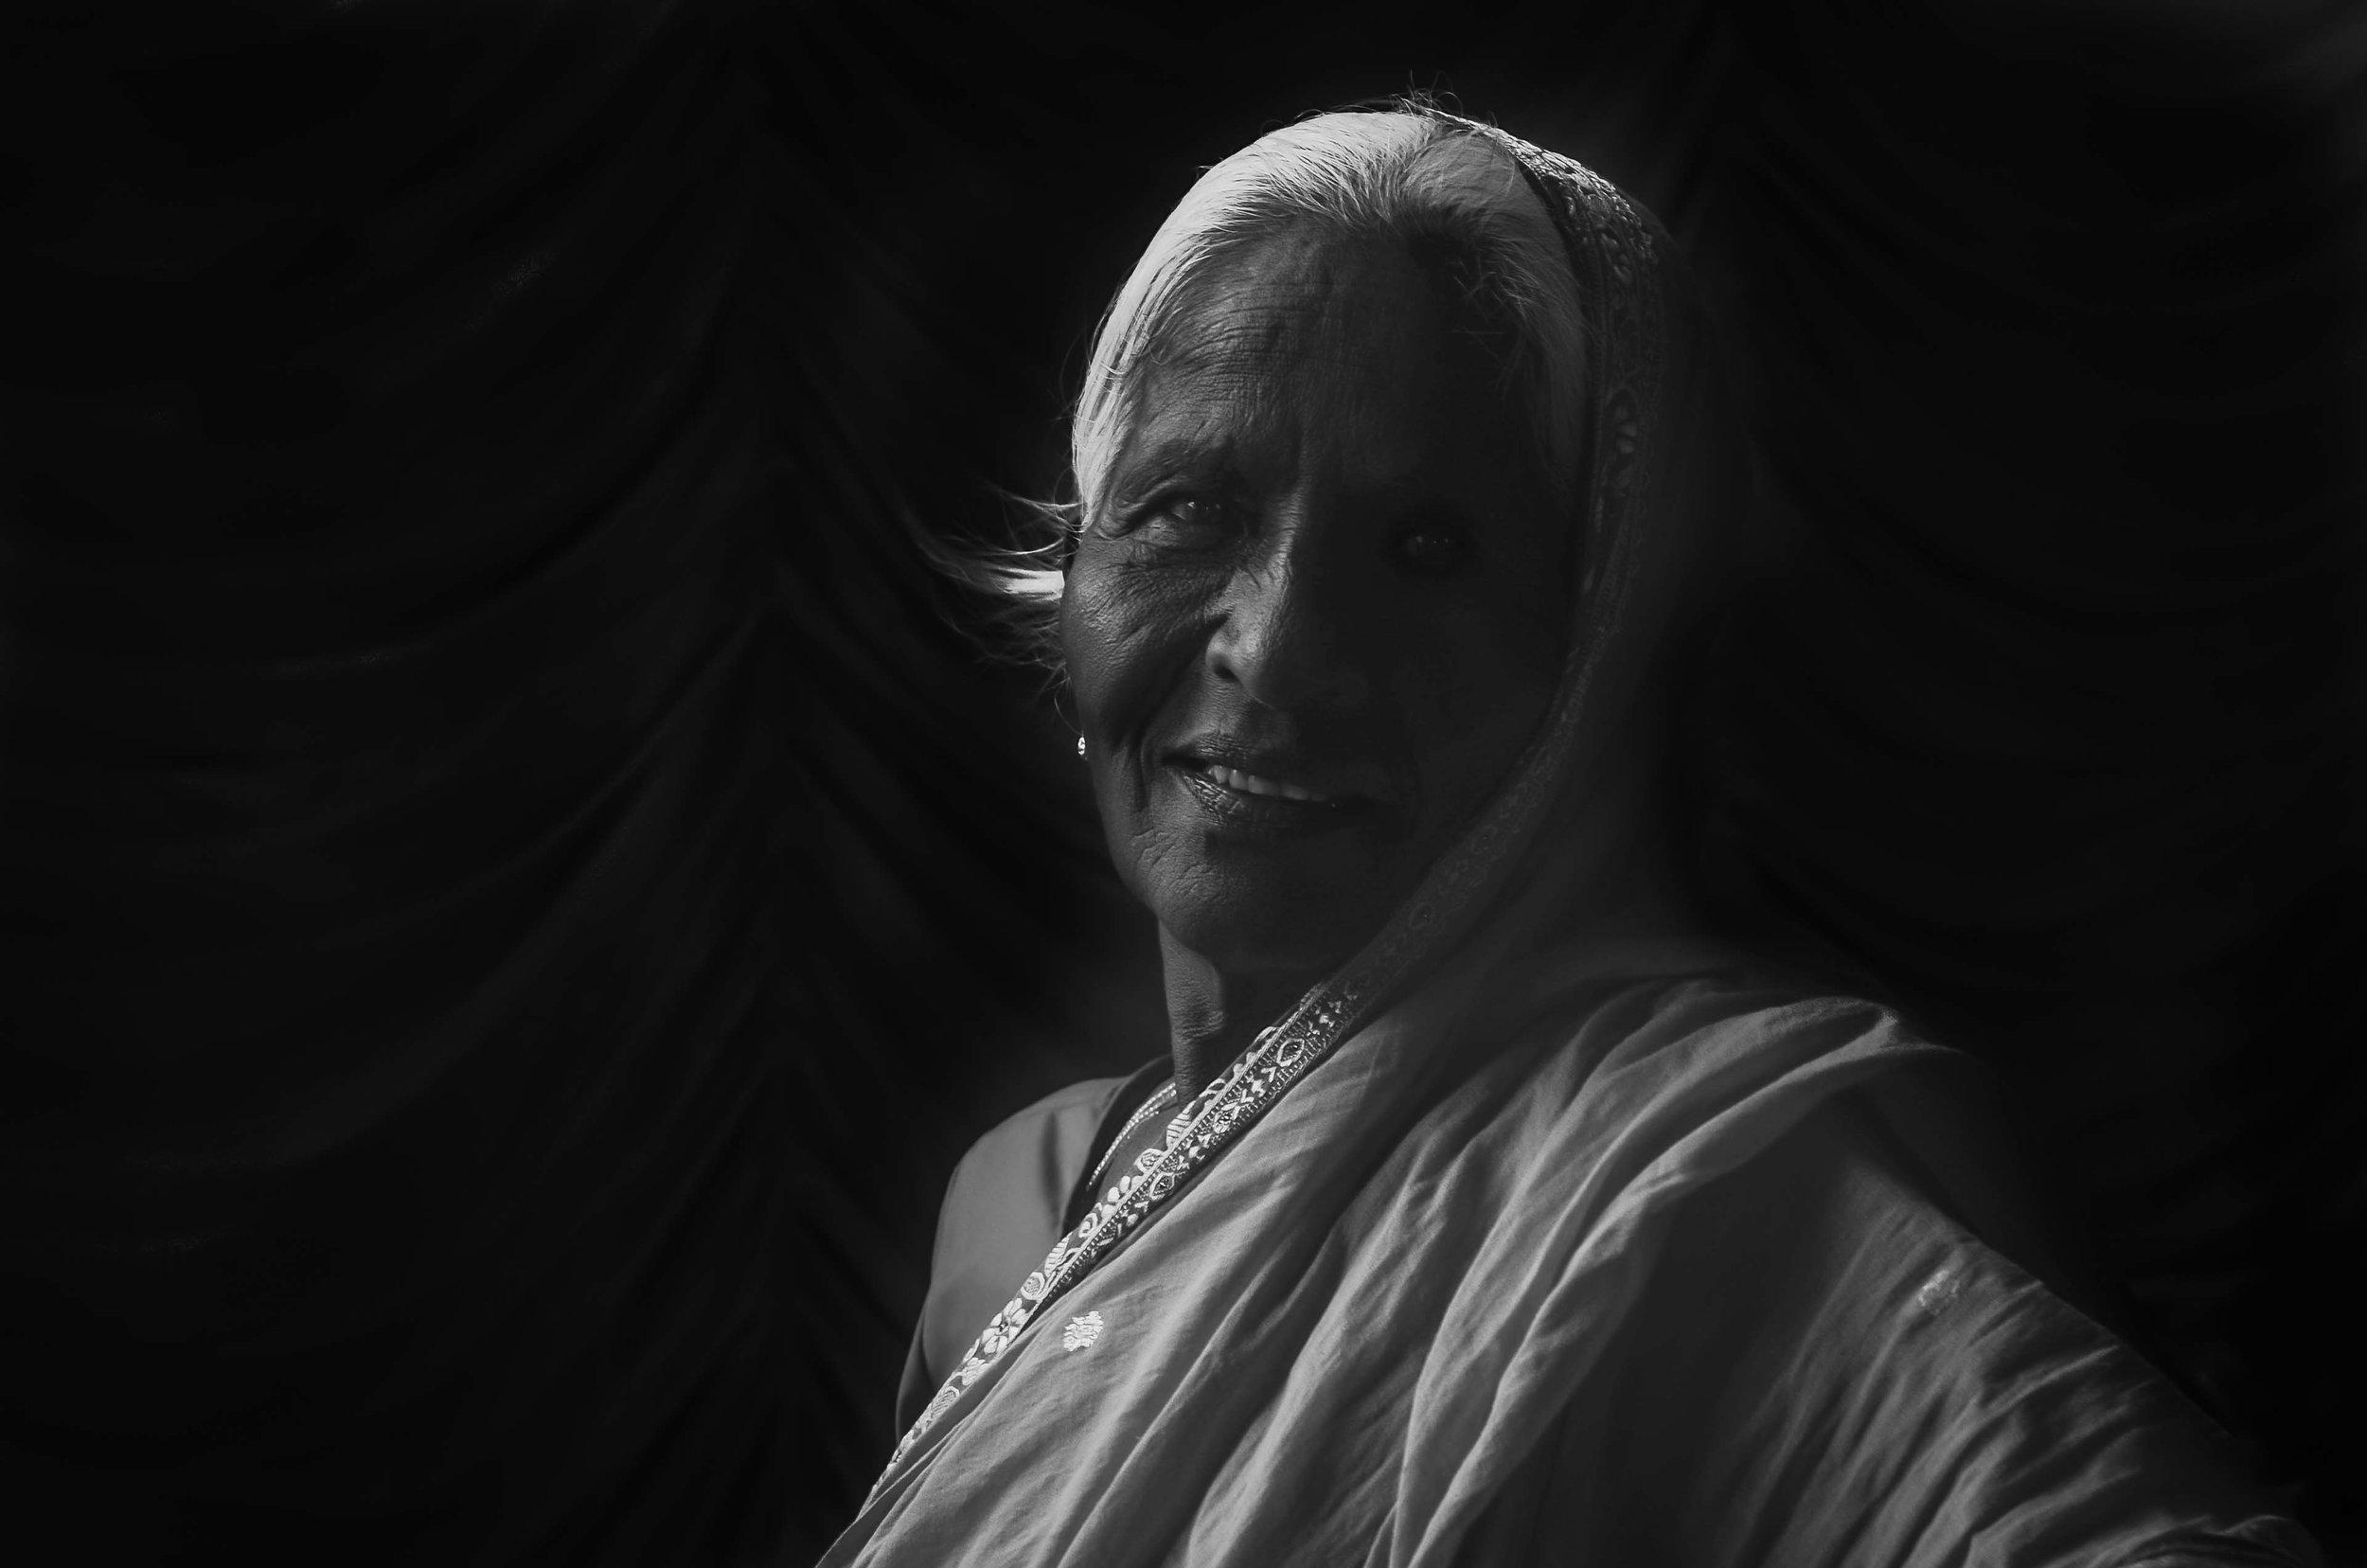 Mumbai, India 2012